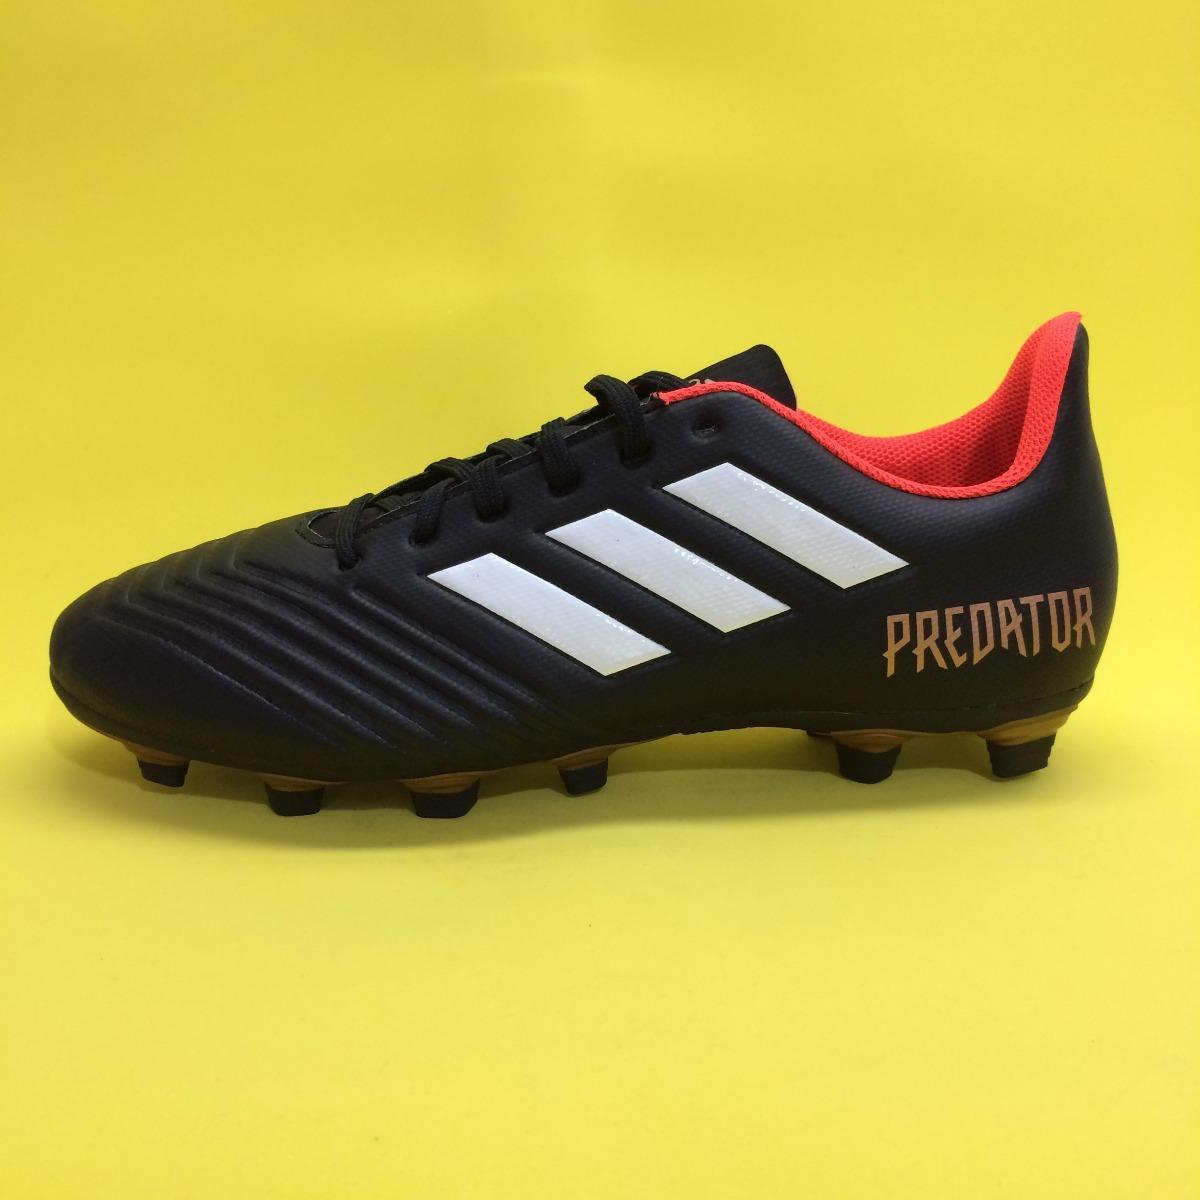 Cp9265 Predator 18 Campo 3 Hombre Bs adidas Futbol Zapatos q7pfSS abb8ea81b013c